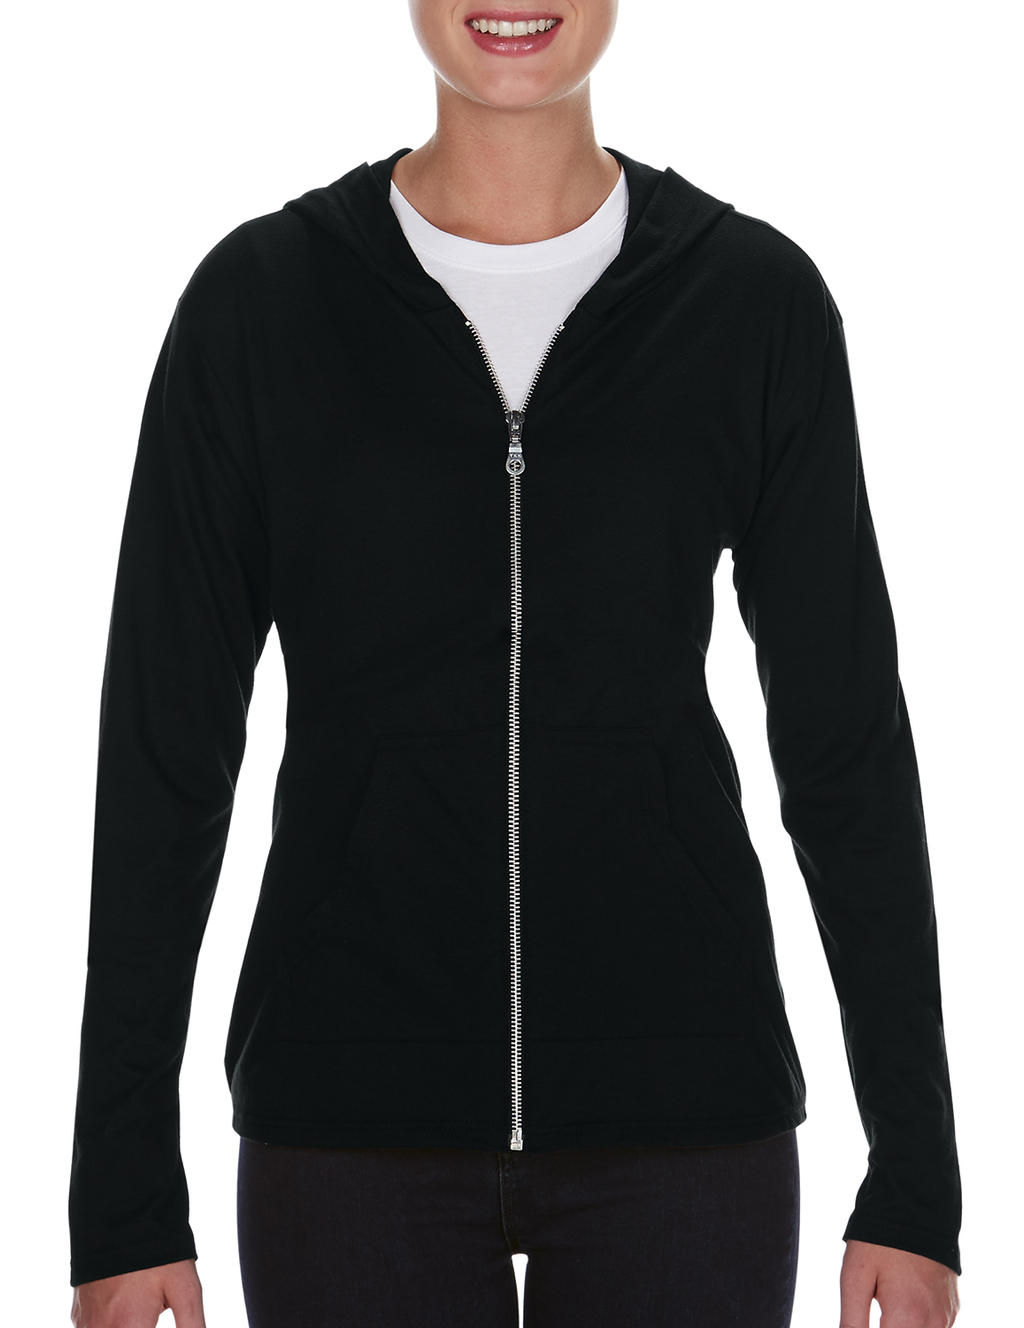 Womens` Tri-Blend Full Zip Hooded Jacket